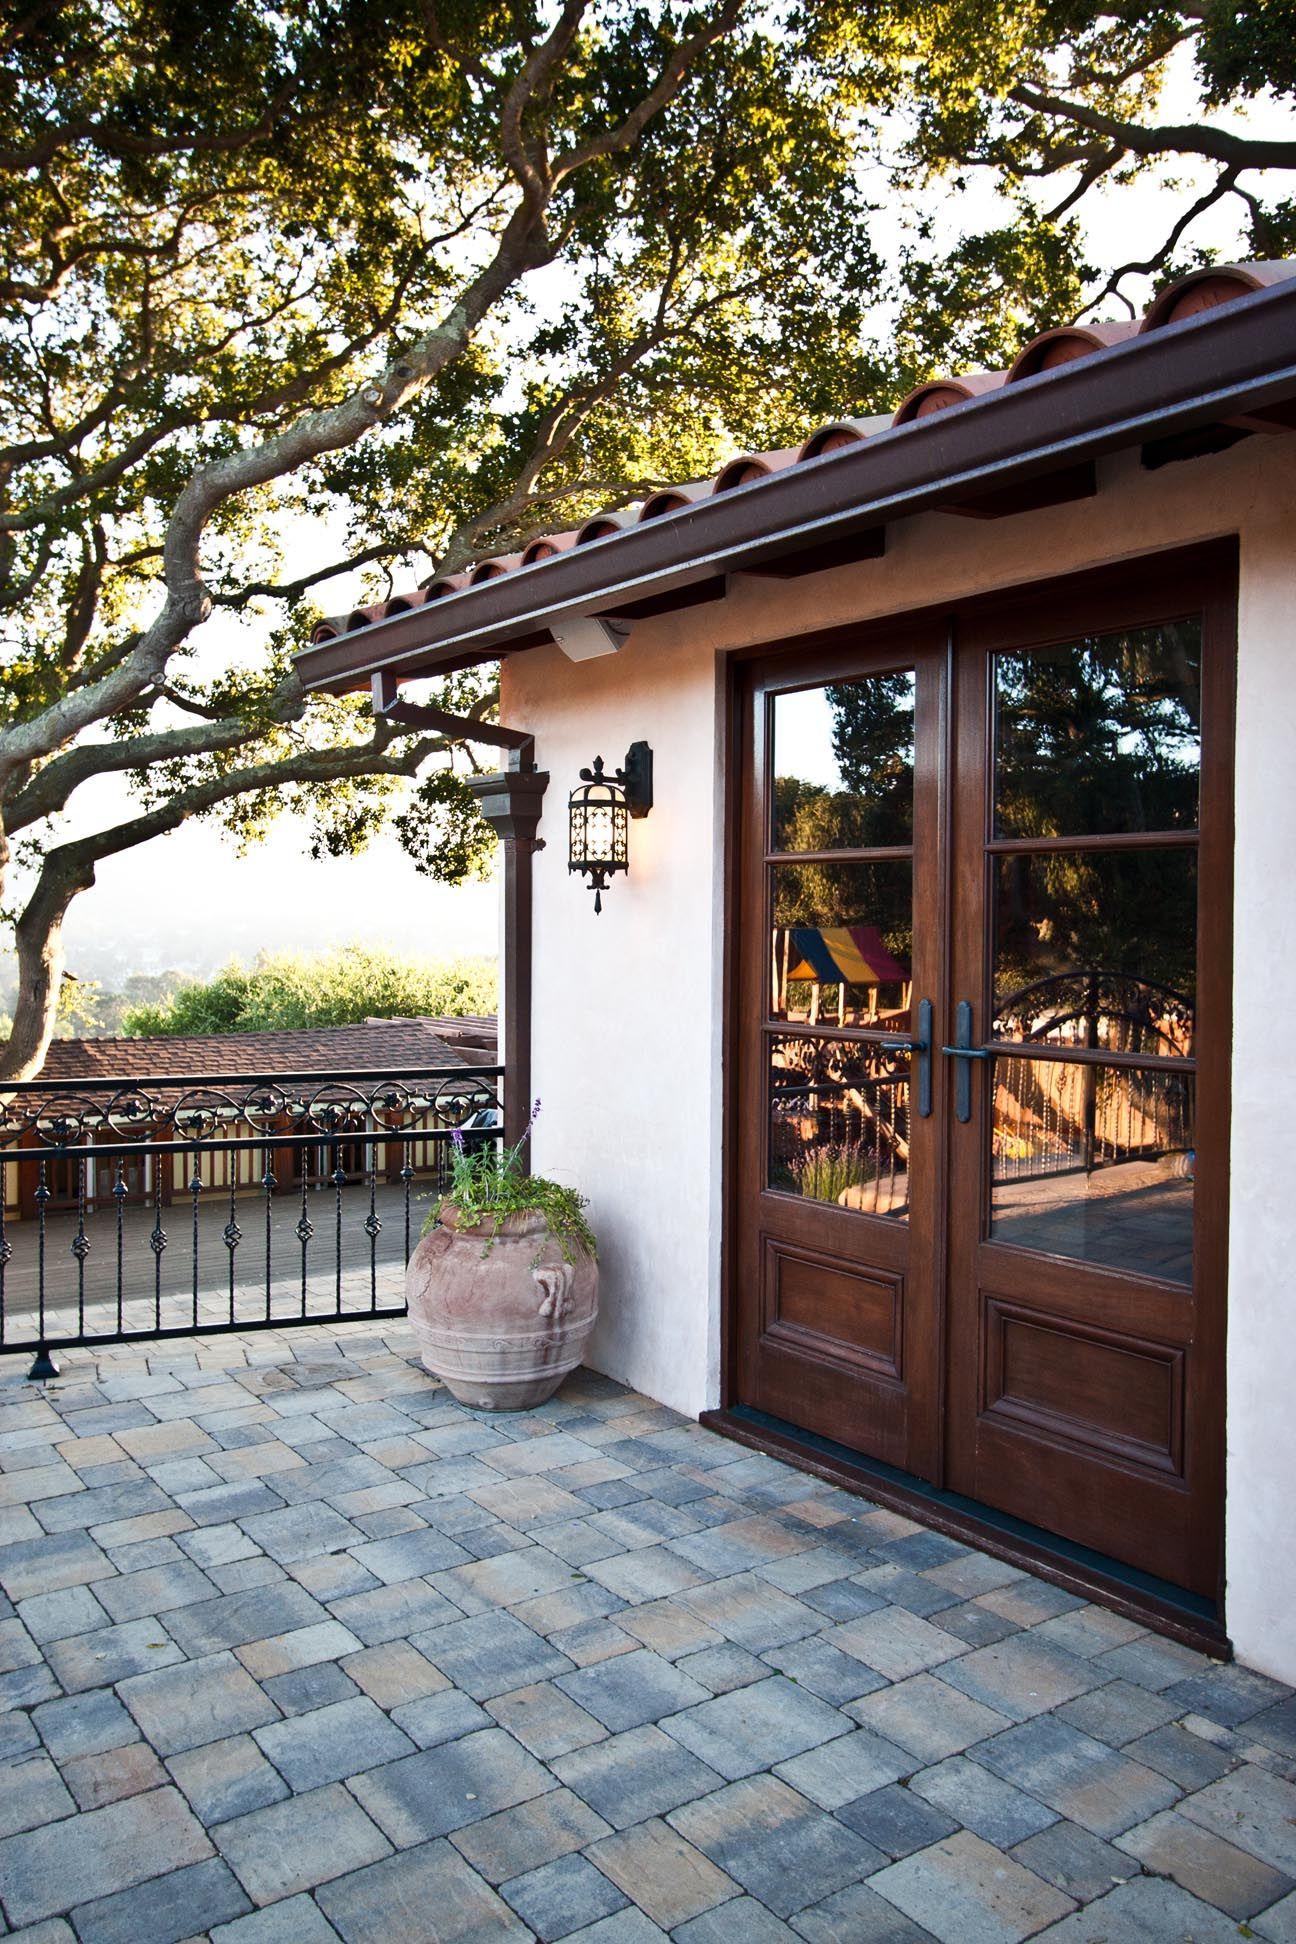 clay tile roof, dark brown gutters, wrought iron fixtures (lights